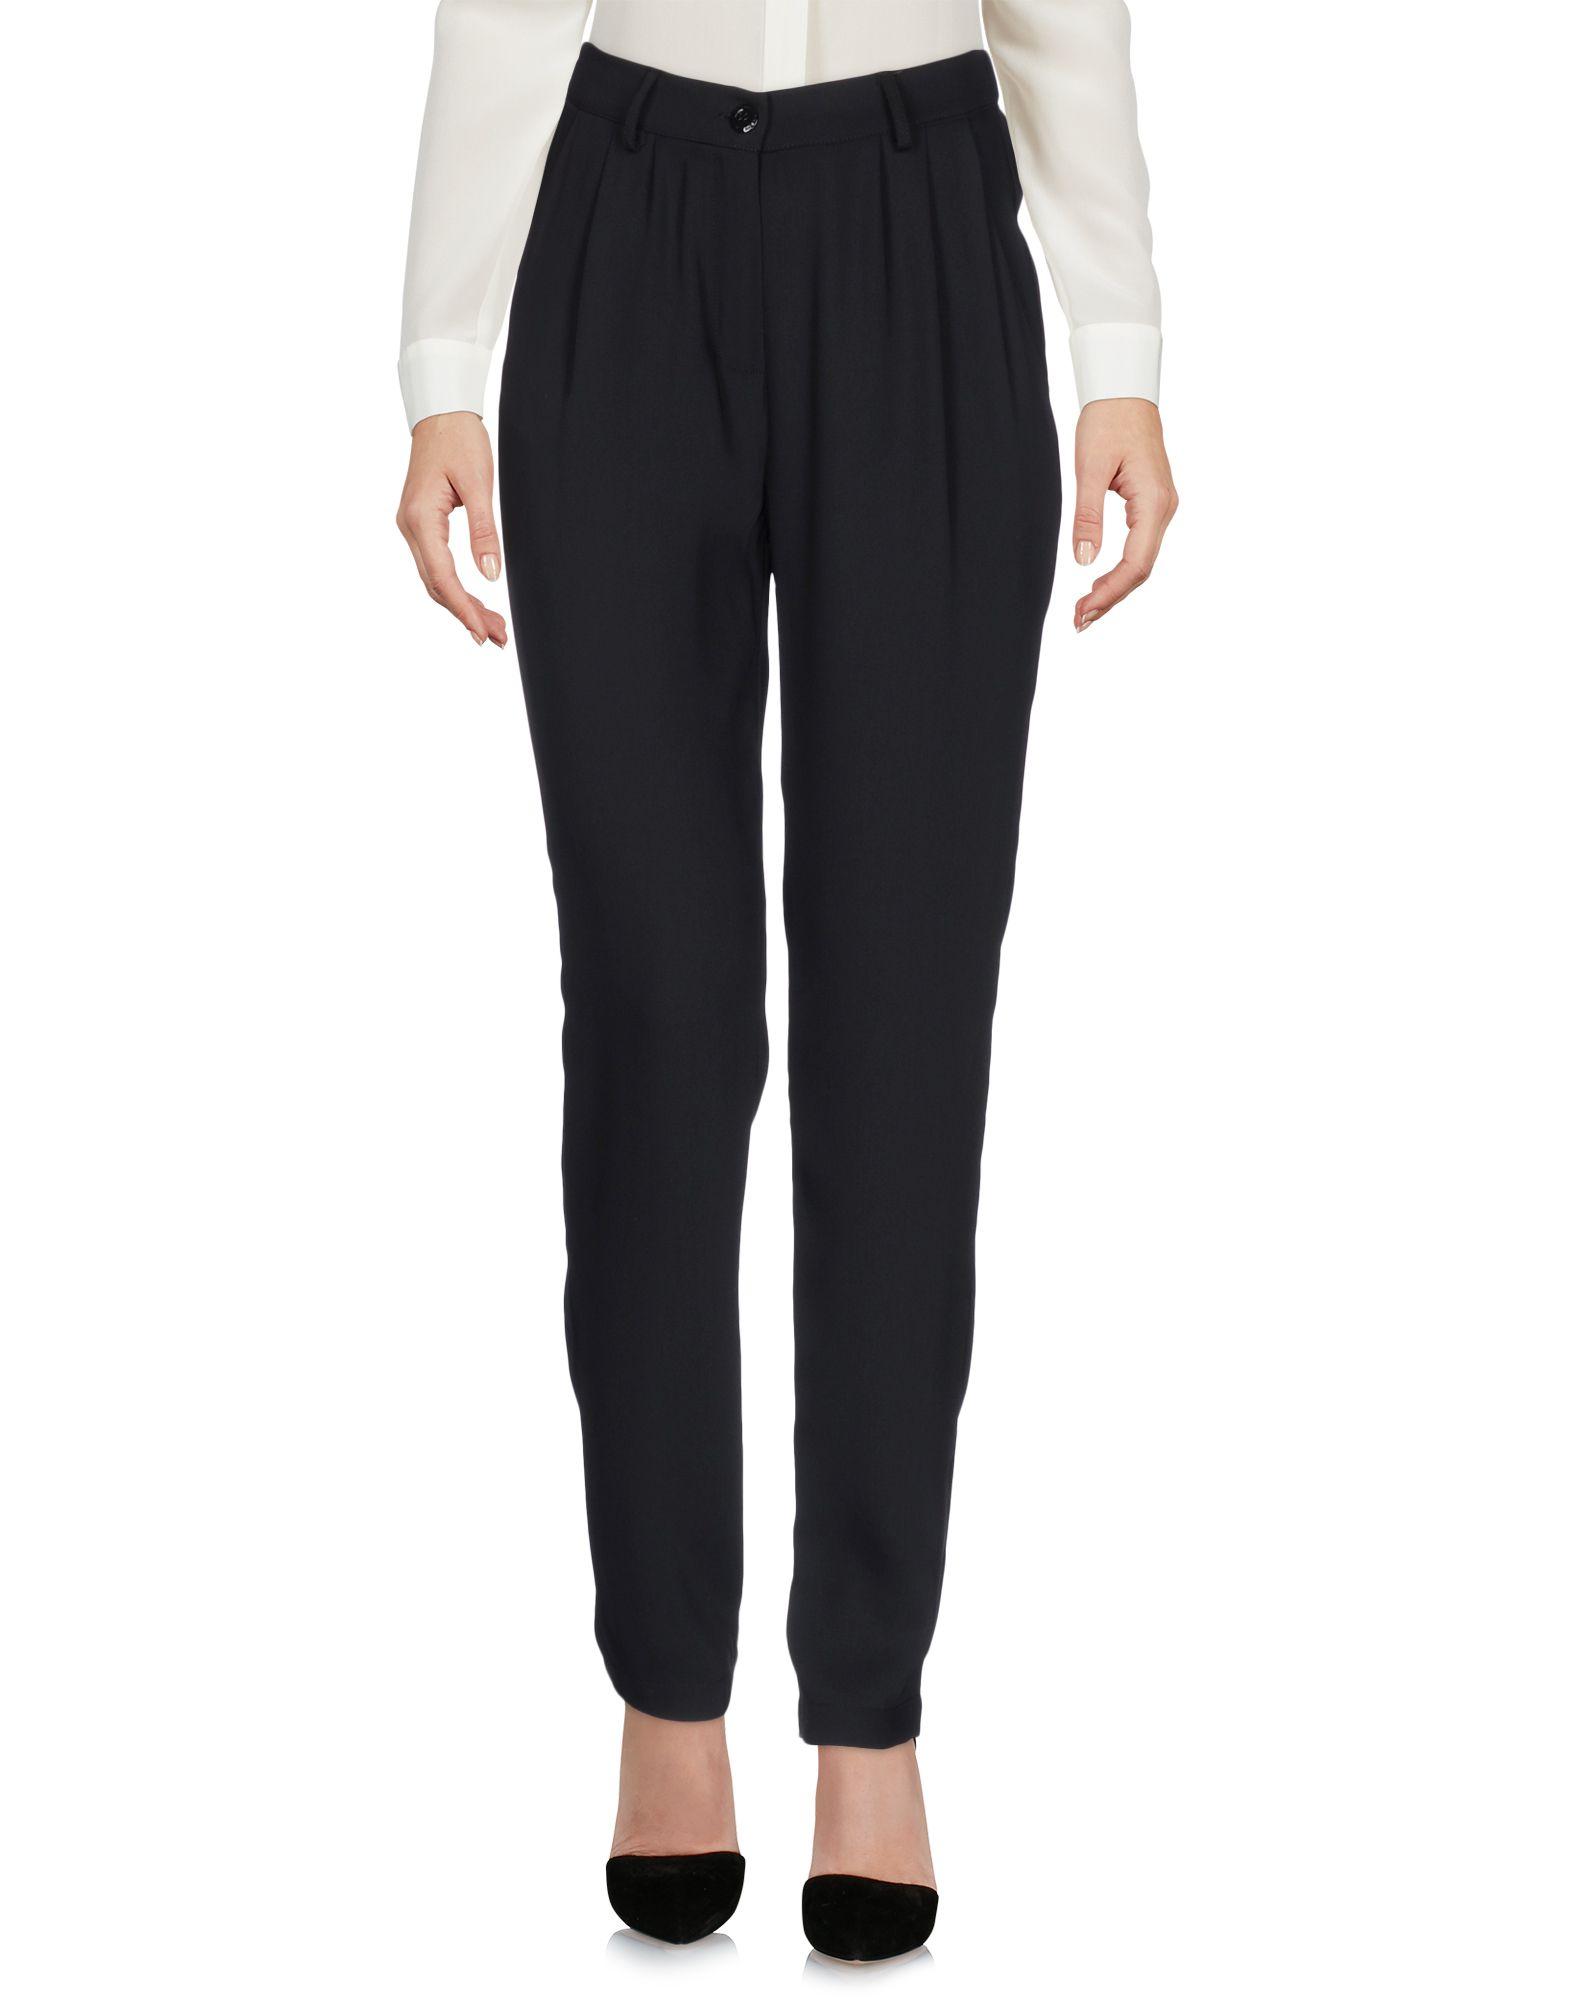 Pantalone Trussardi Jeans donna - 36999545TK 36999545TK